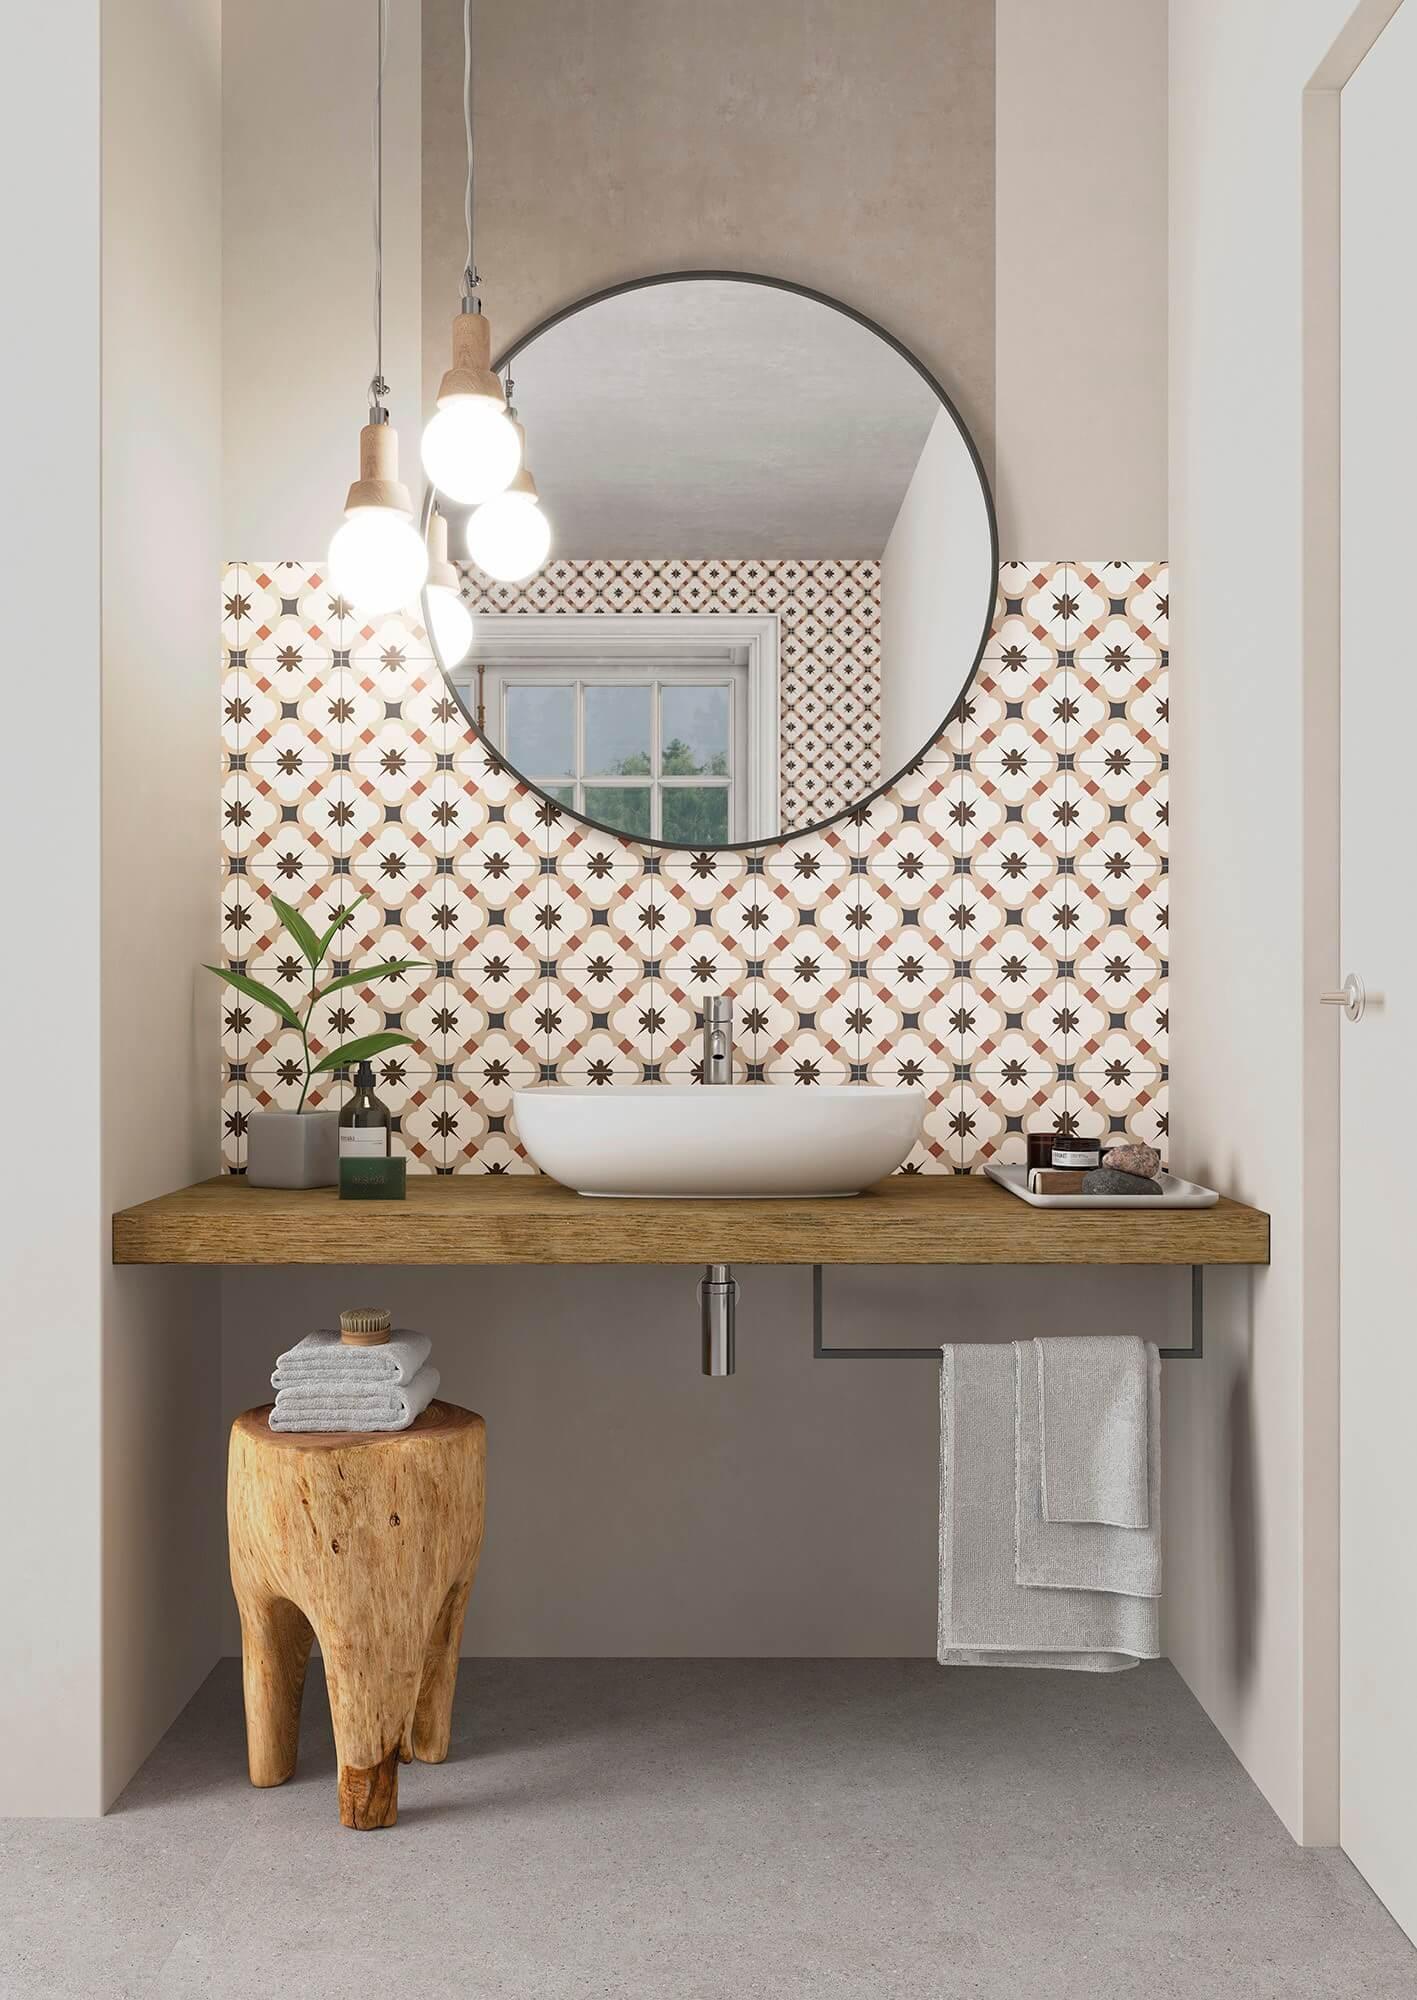 gayafores grace beige hydraulic tiles hidráulicos